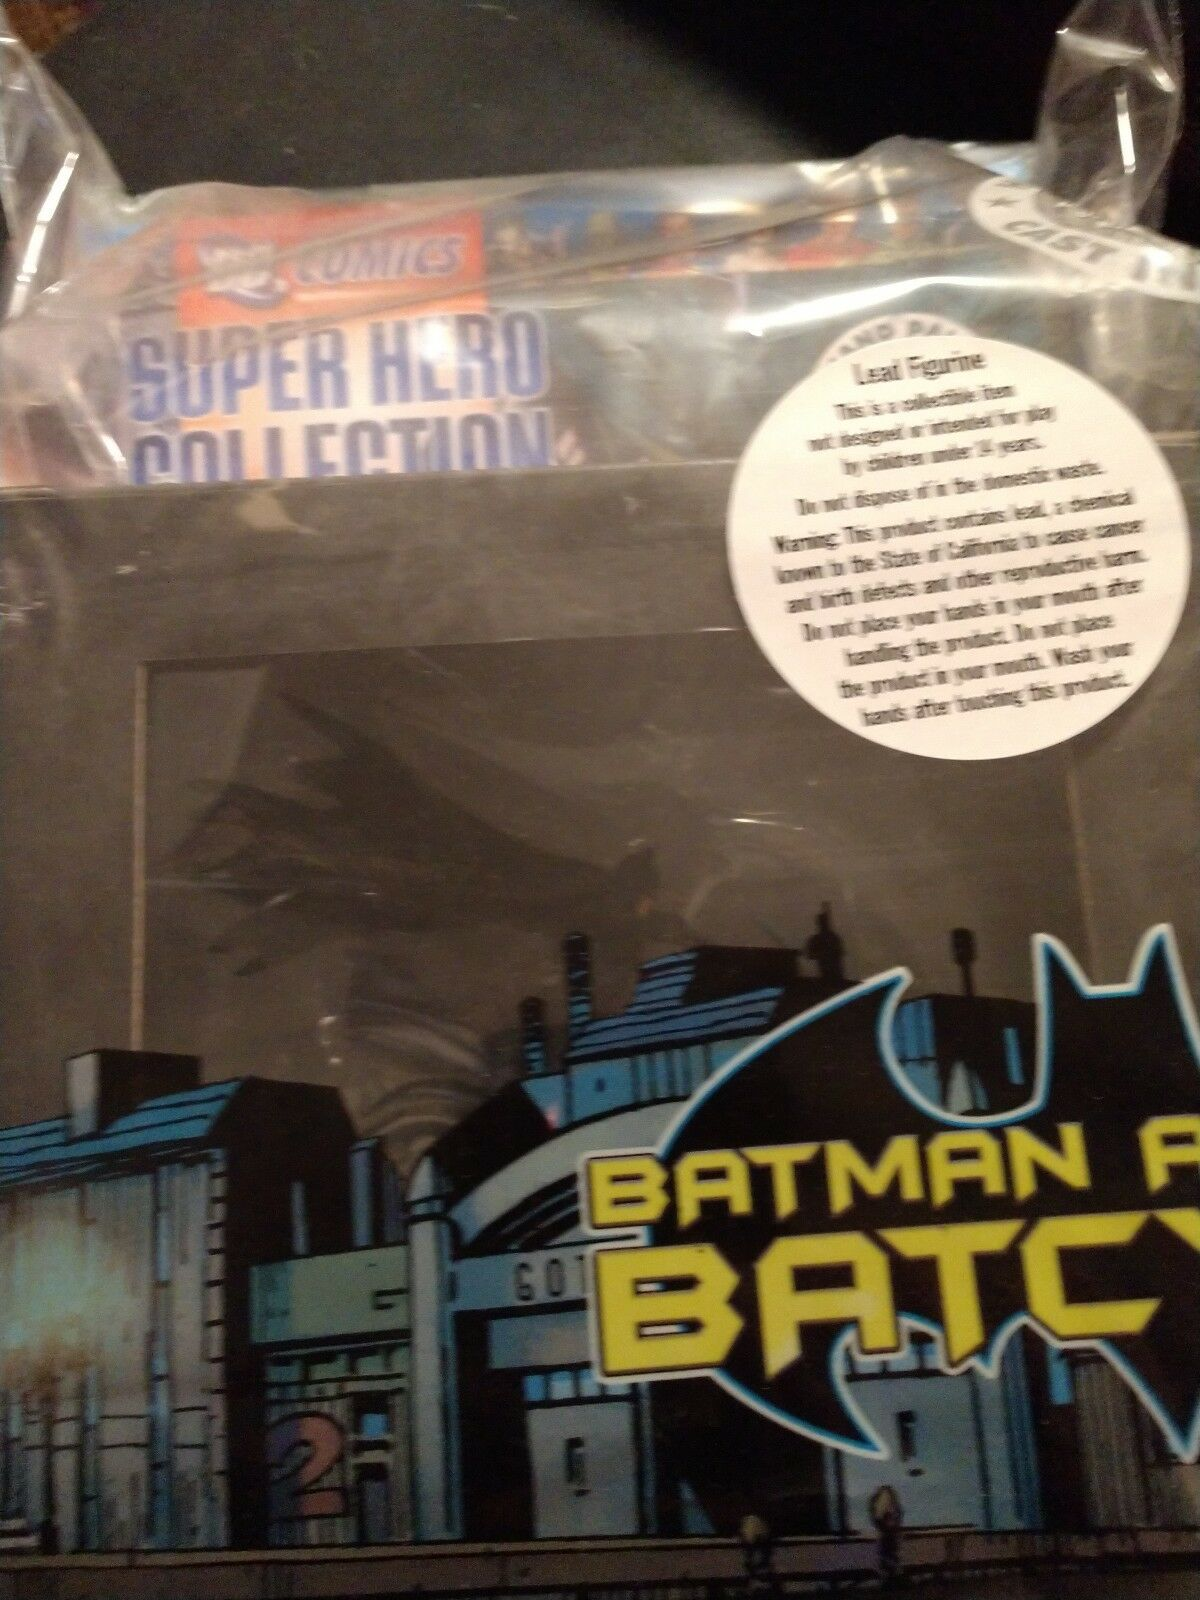 DC Superhero Batman and Batcycle with Magazine  1